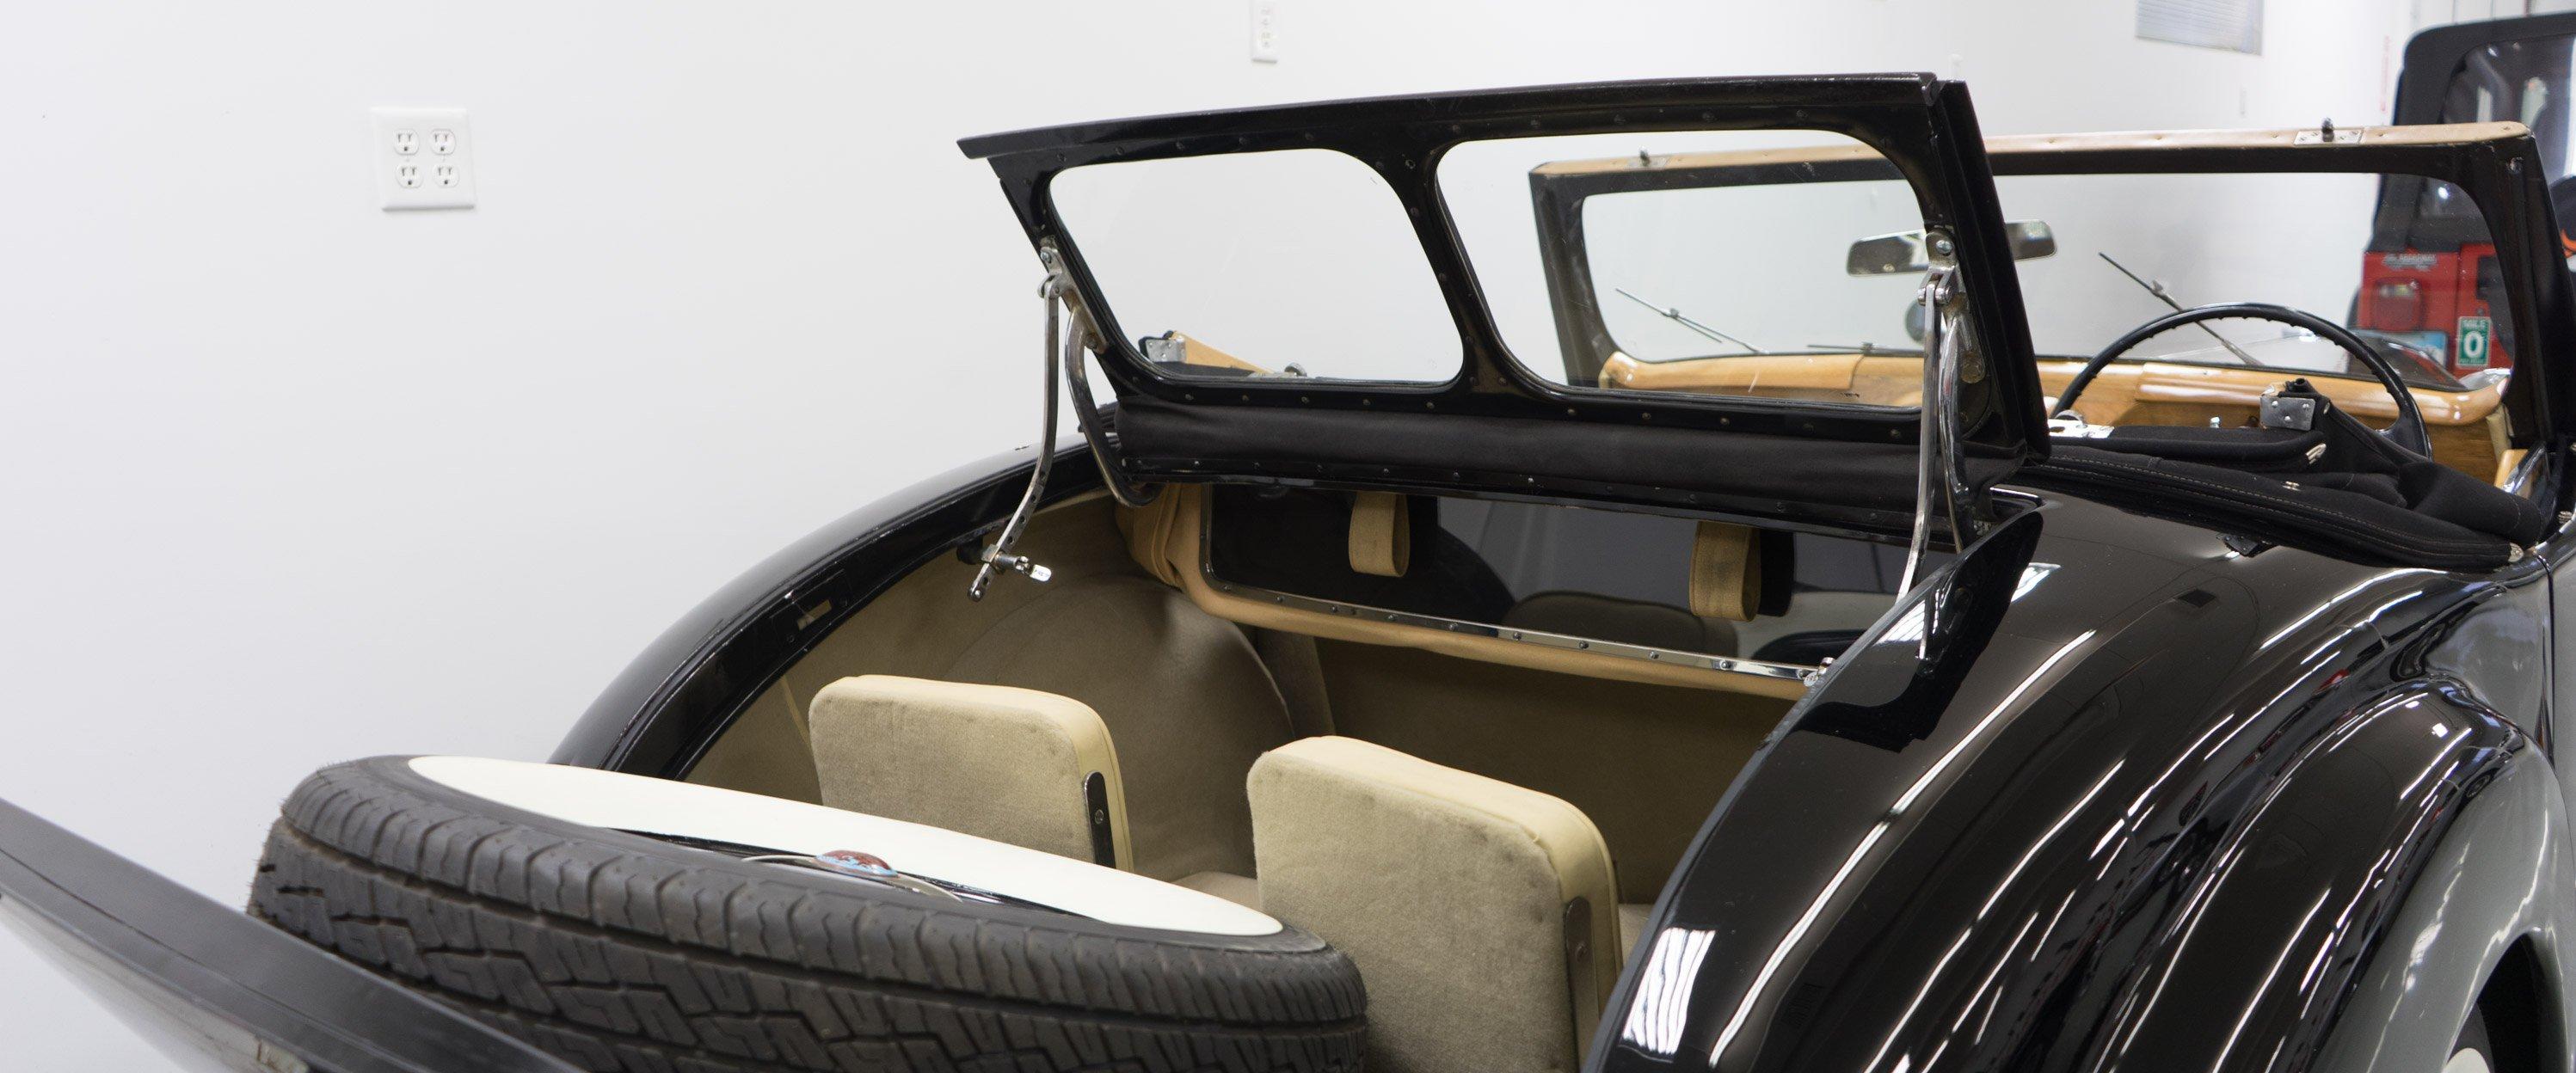 1946-Triumph-1800-Roadster-Black-slideshow-014@2x